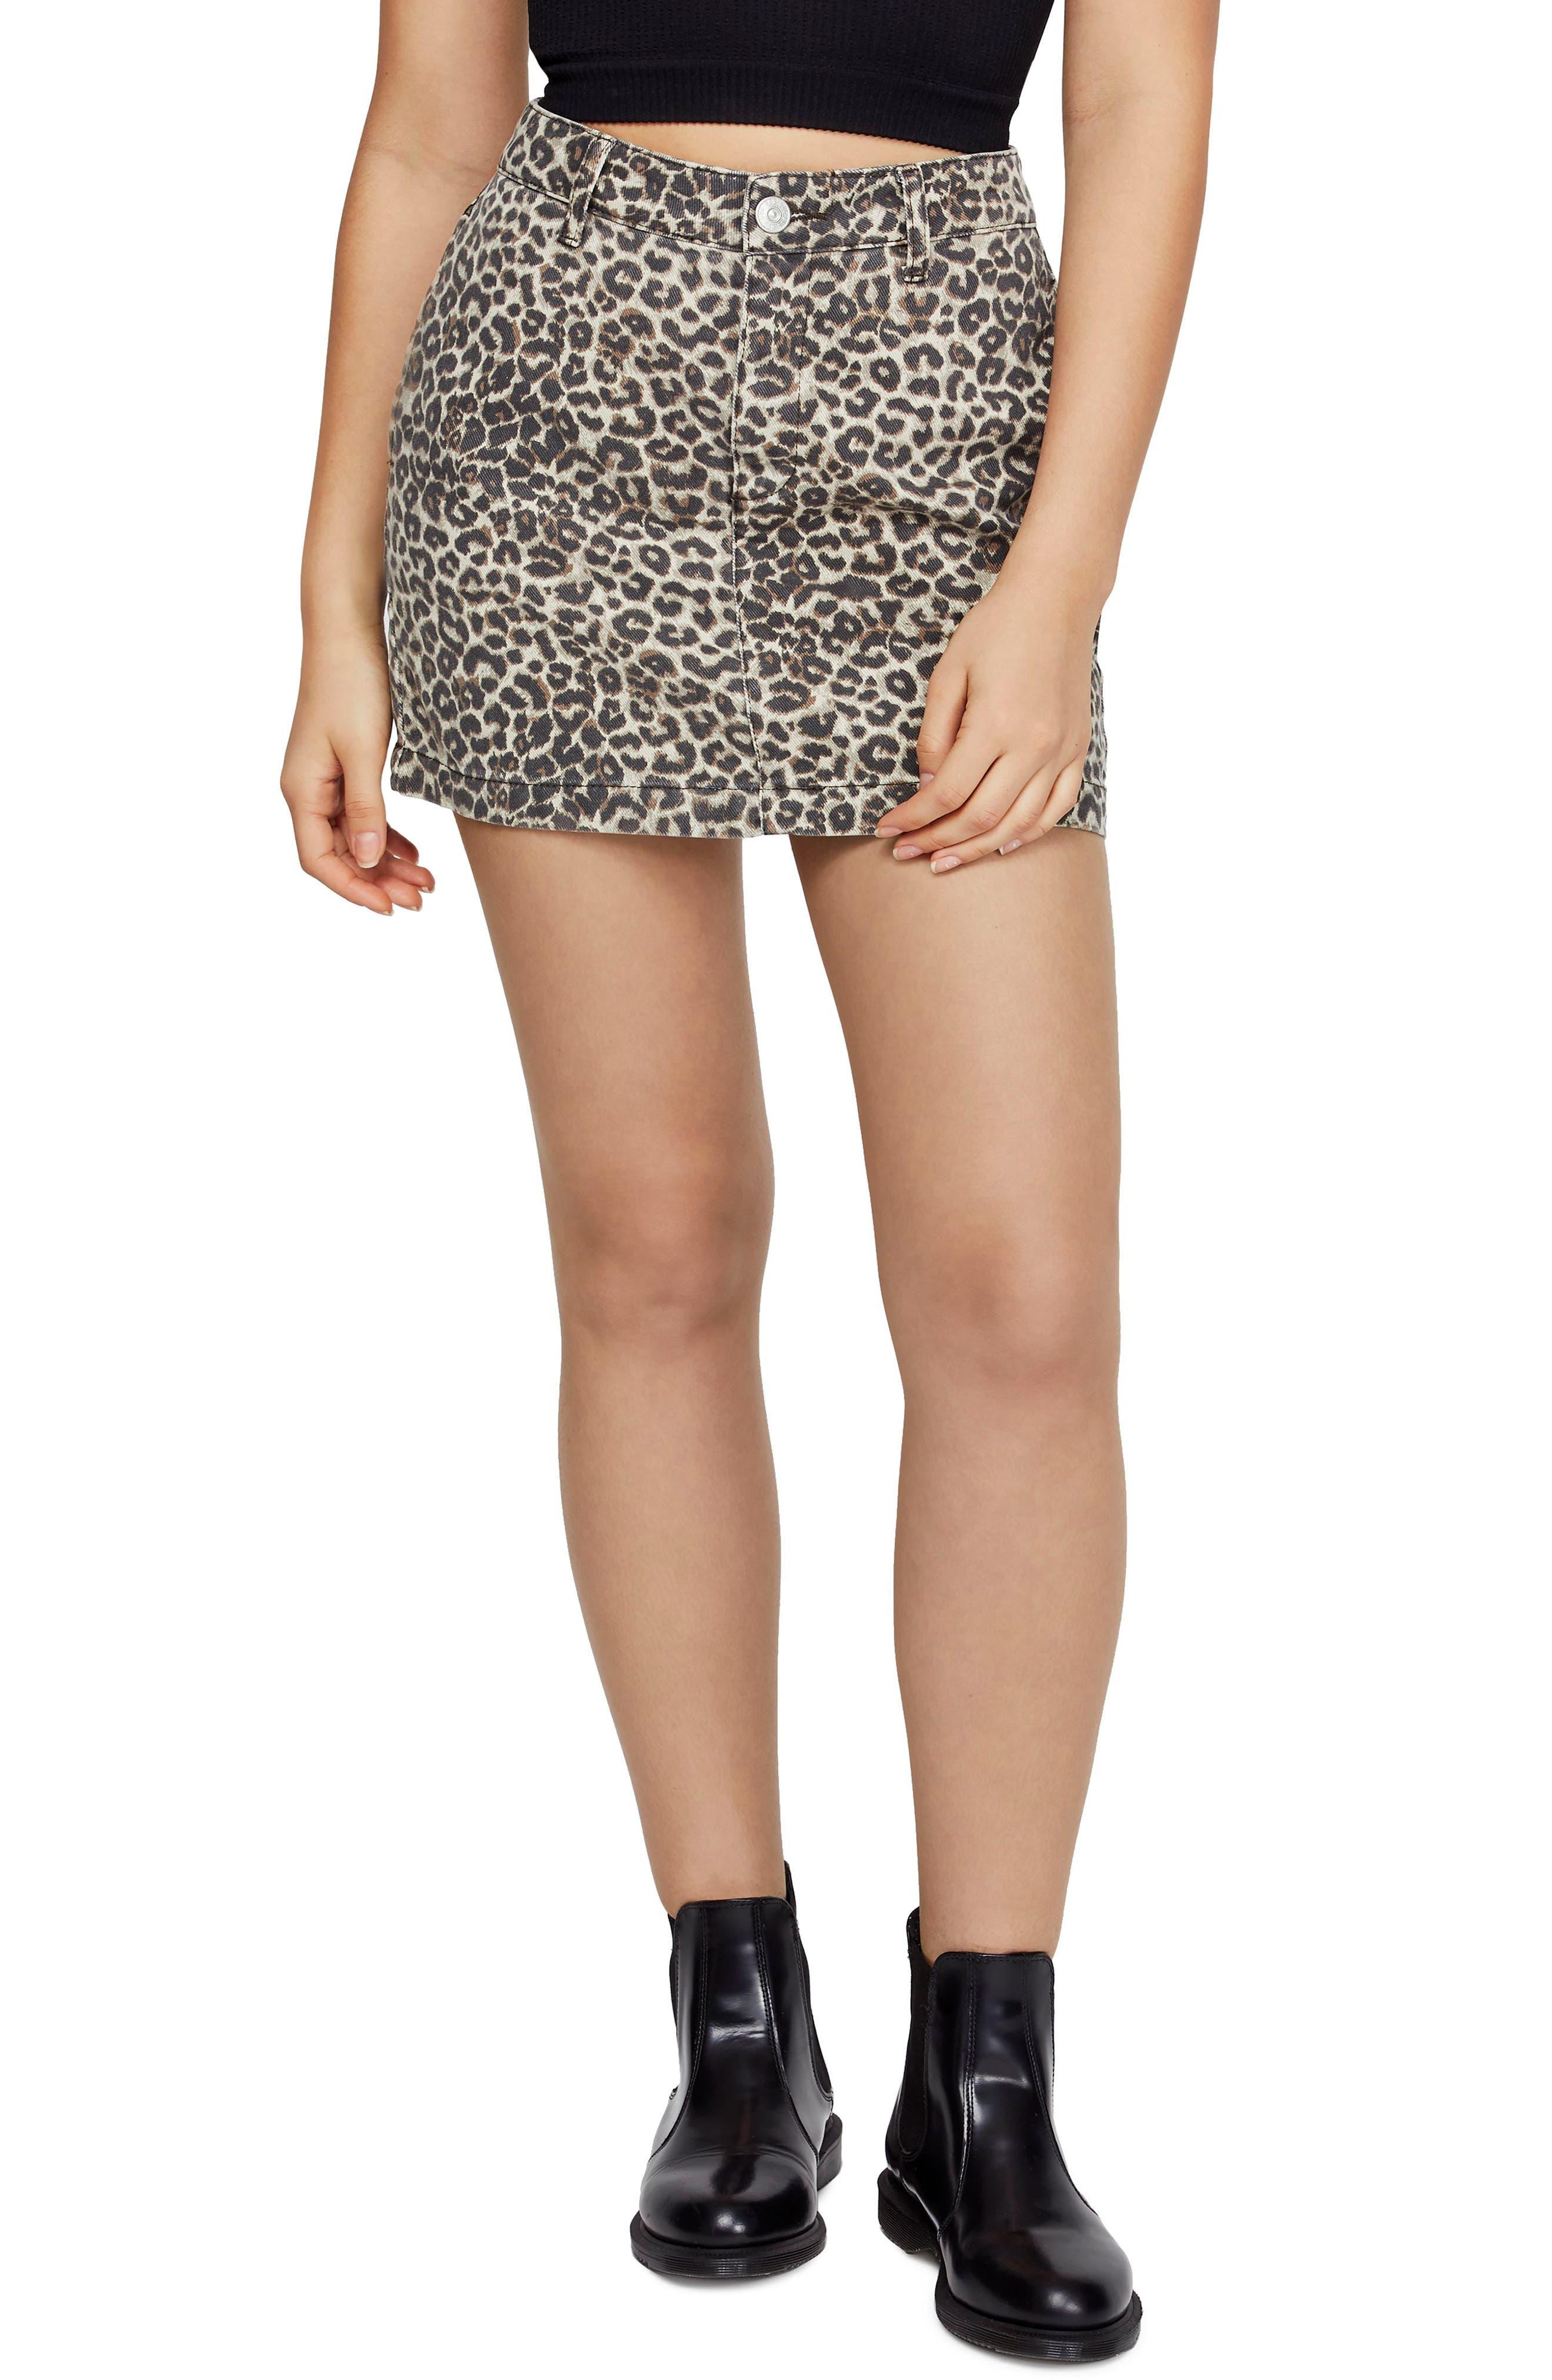 Bdg Urban Outfitters Leopard Twill Miniskirt, Brown